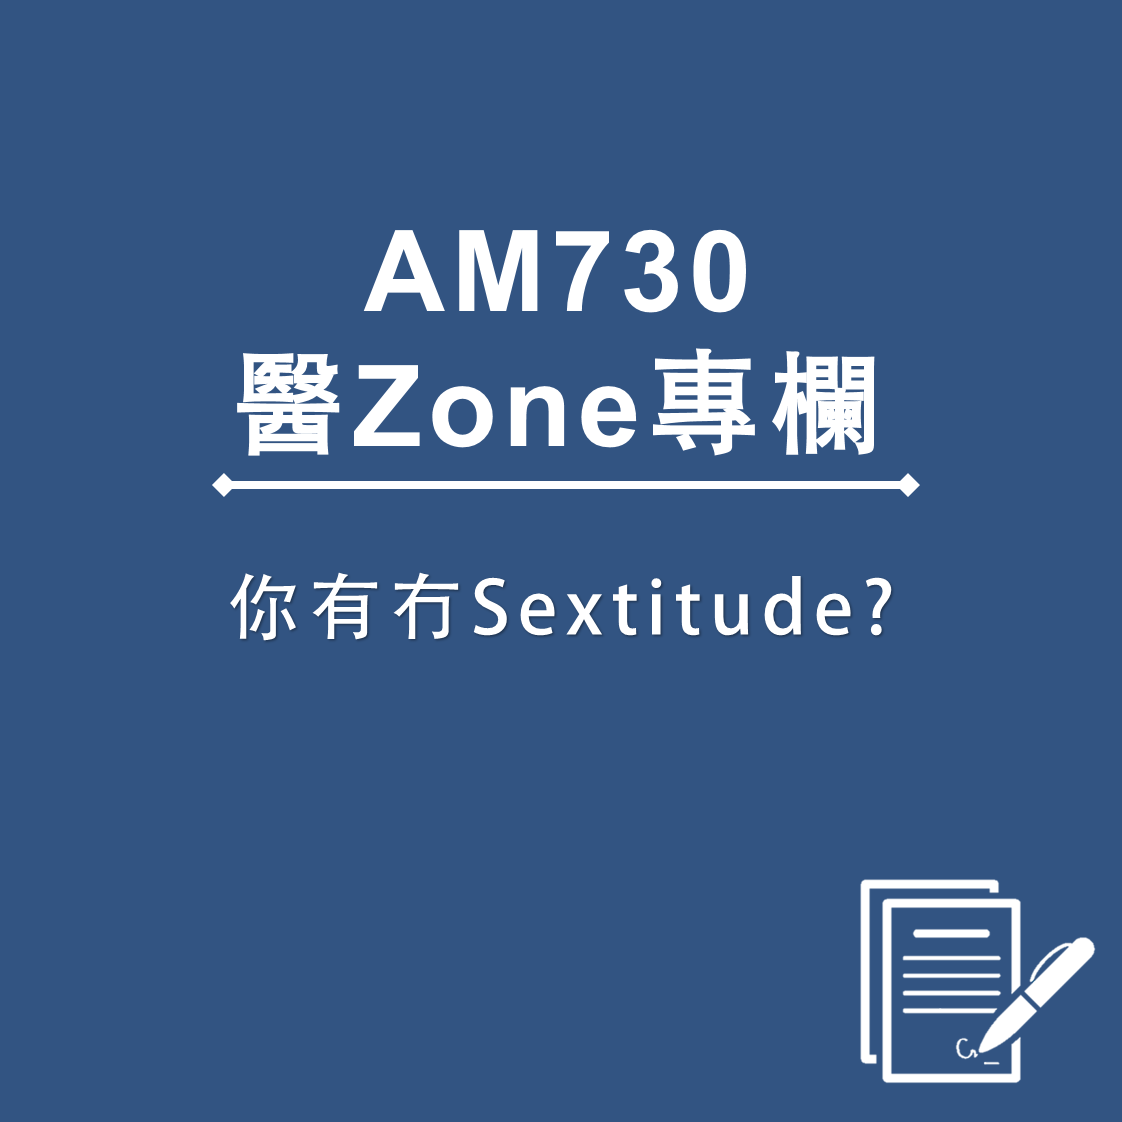 AM730 醫Zone 專欄 - 你有冇Sextitude?